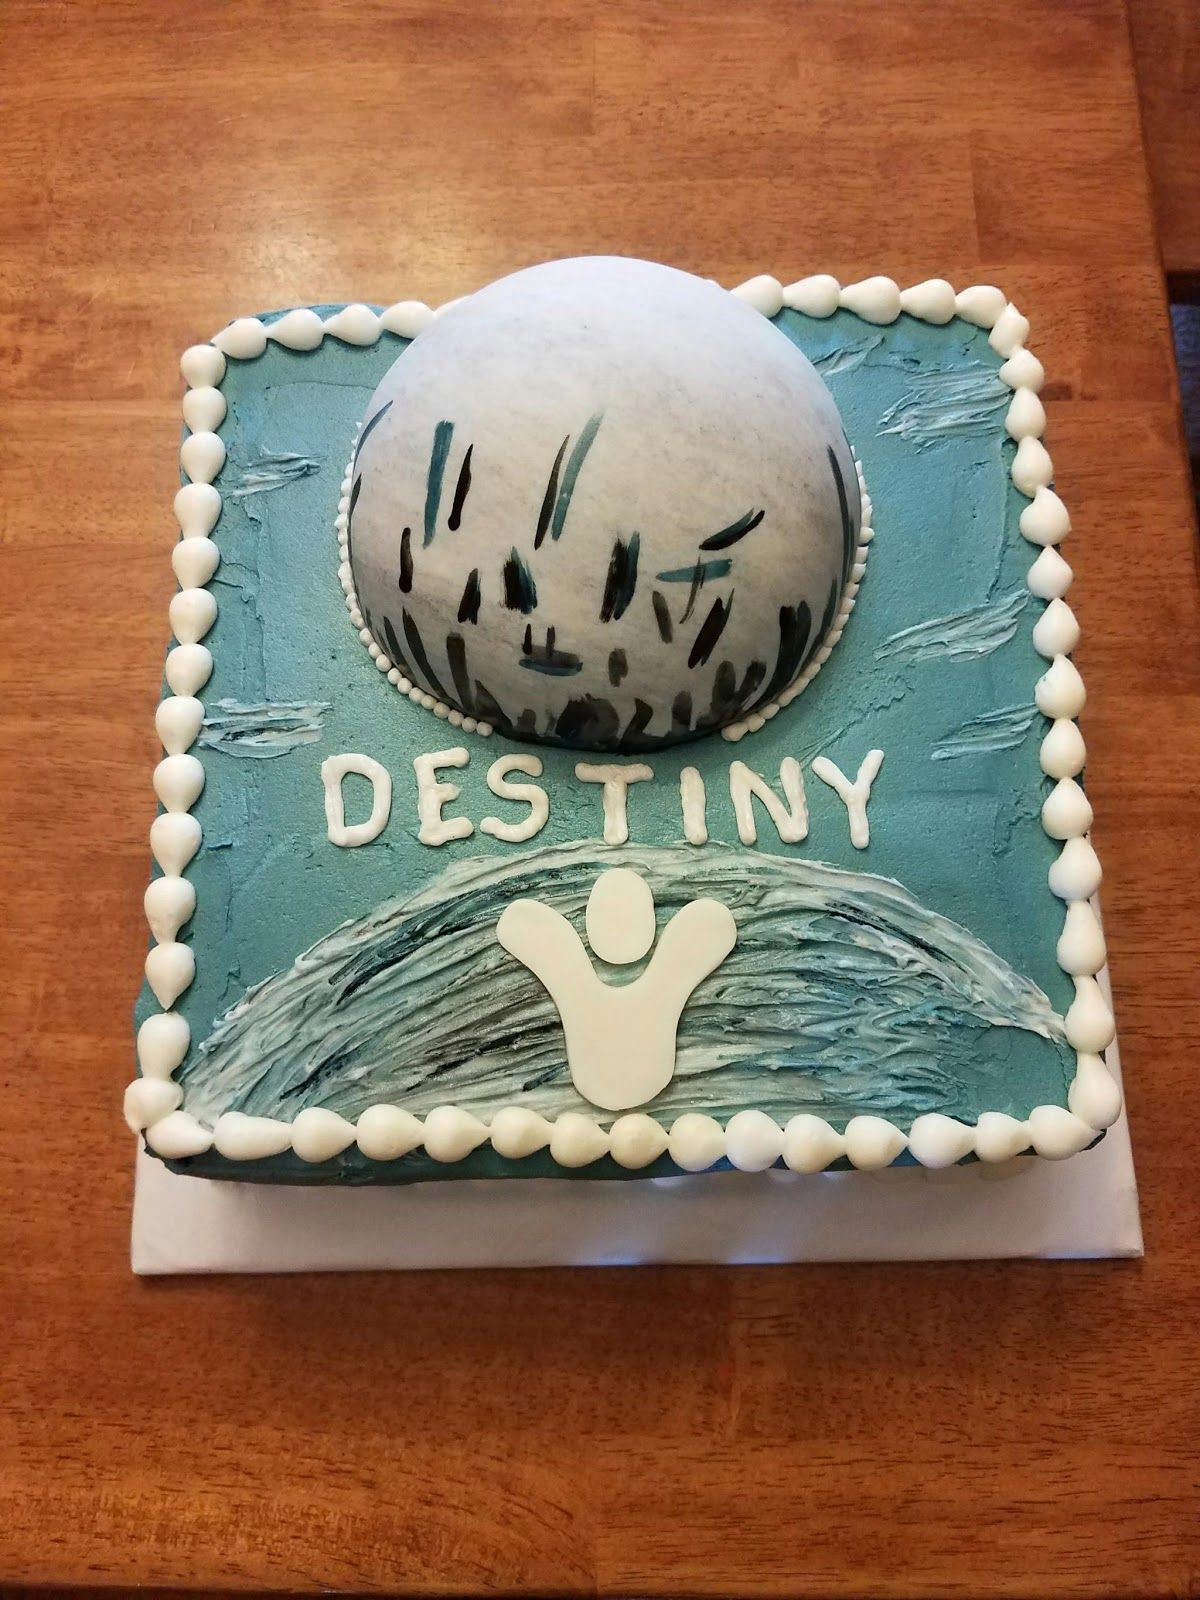 Destiny Video Game Birthday Cake Cakes Ive Made Pinterest